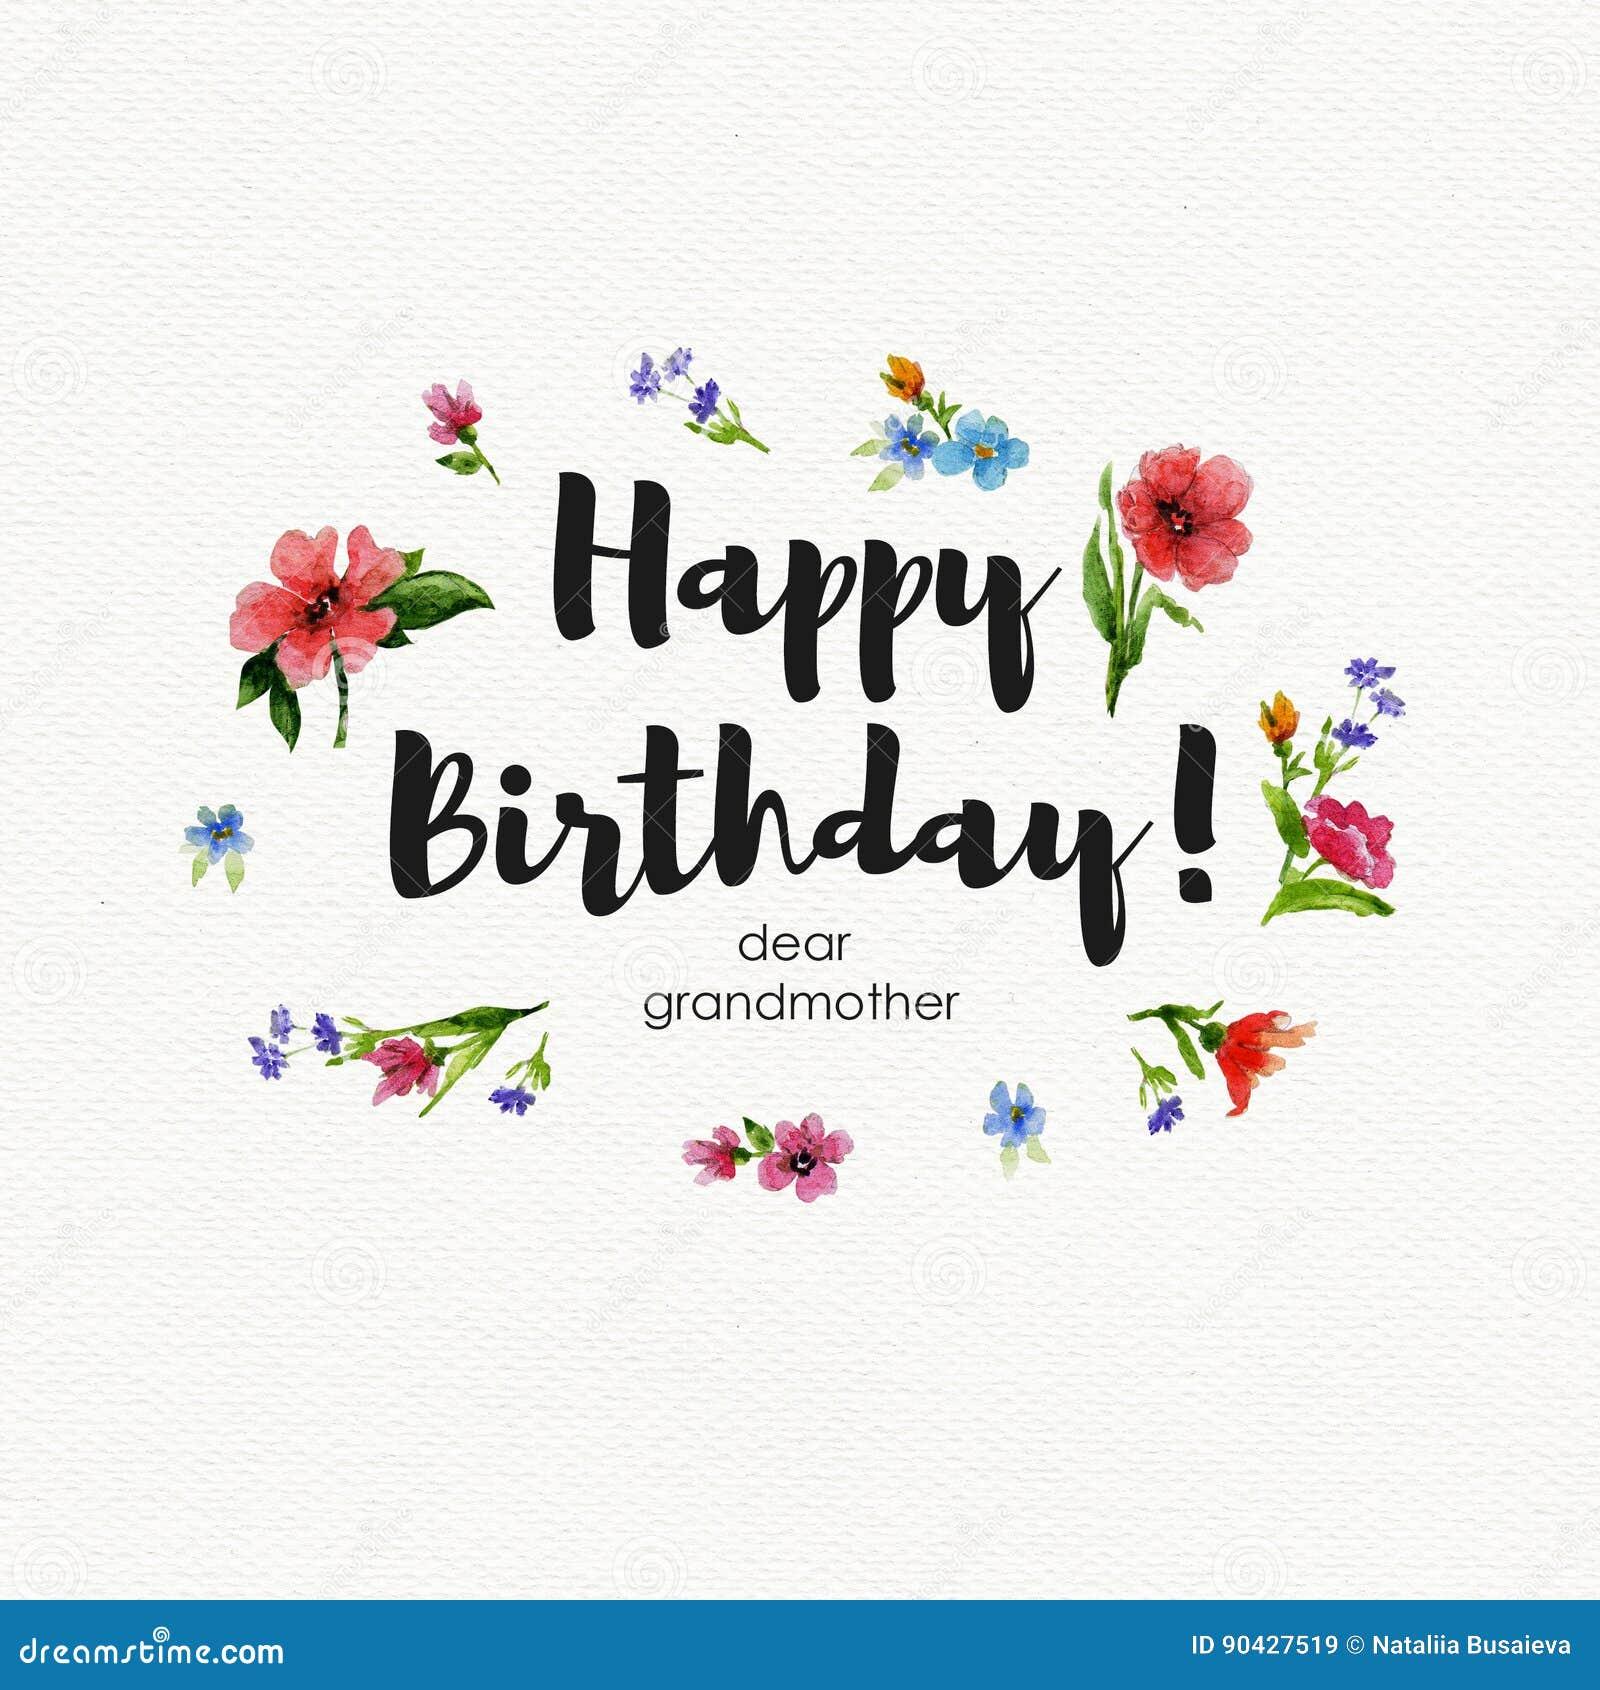 Greeting Card Happy Birthday Dear Grandmother Watercolor